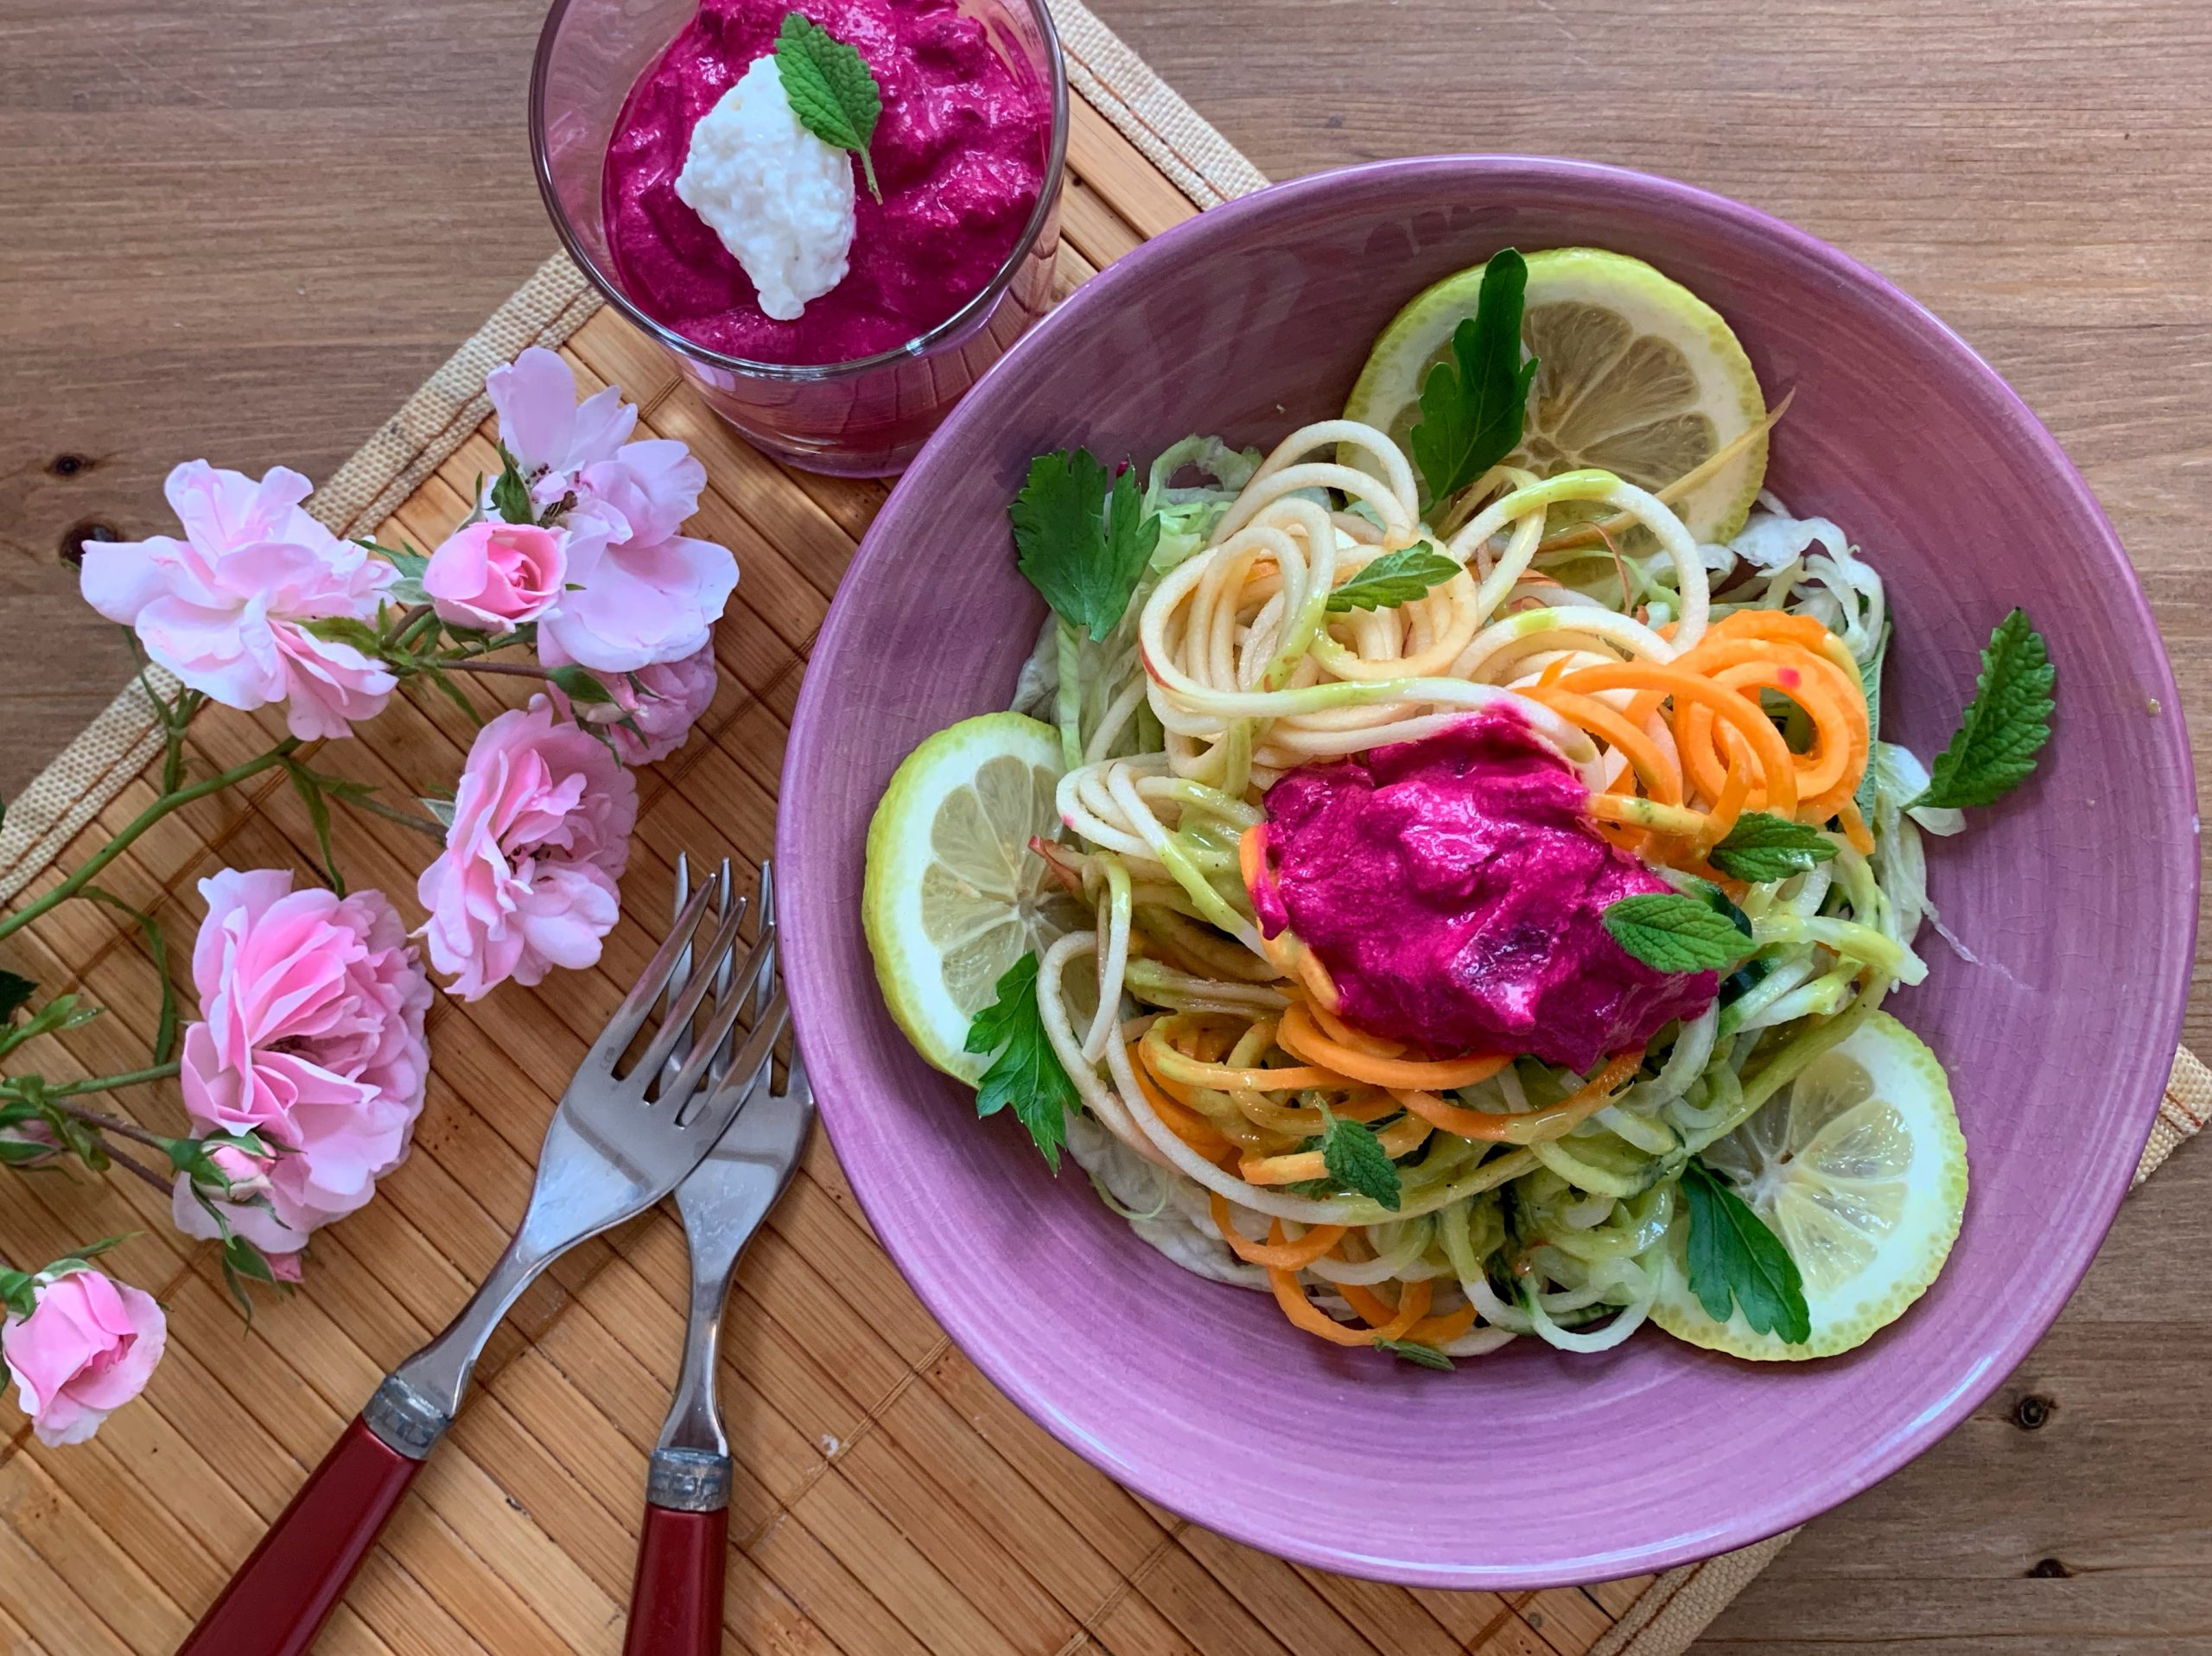 Gemüsespaghetti-Salatbowl mit Basilikum – Feigensenfdressing & rote Bete-Meerrettich-Dip